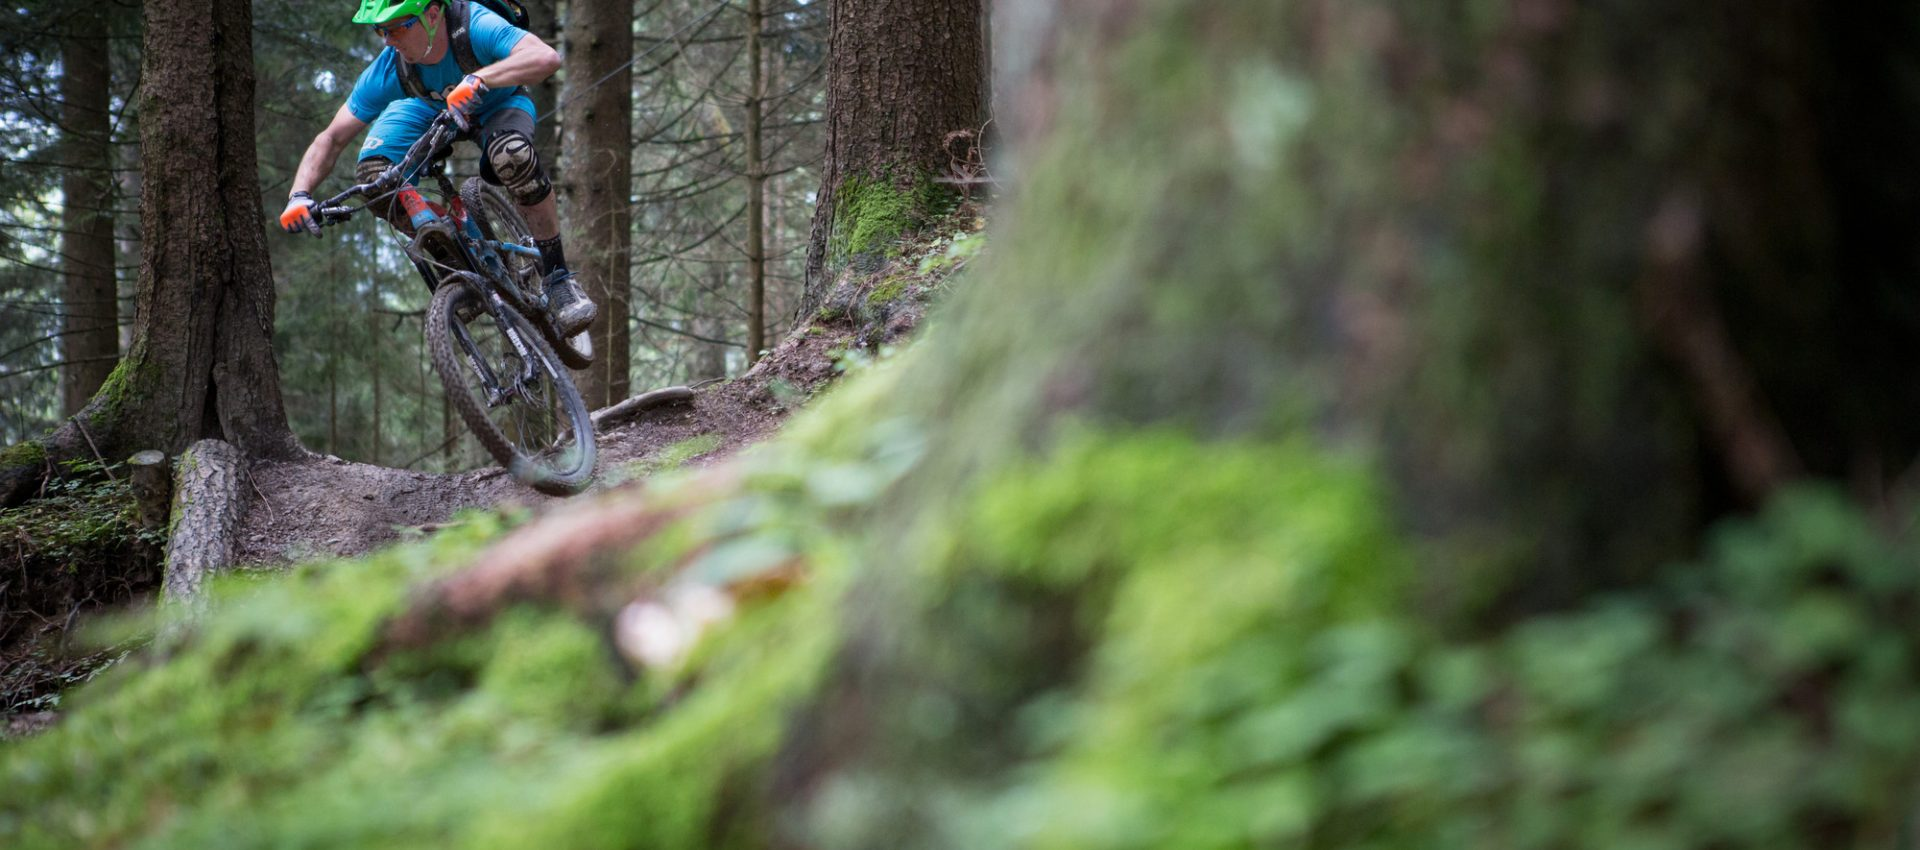 Mountain biker down-hill